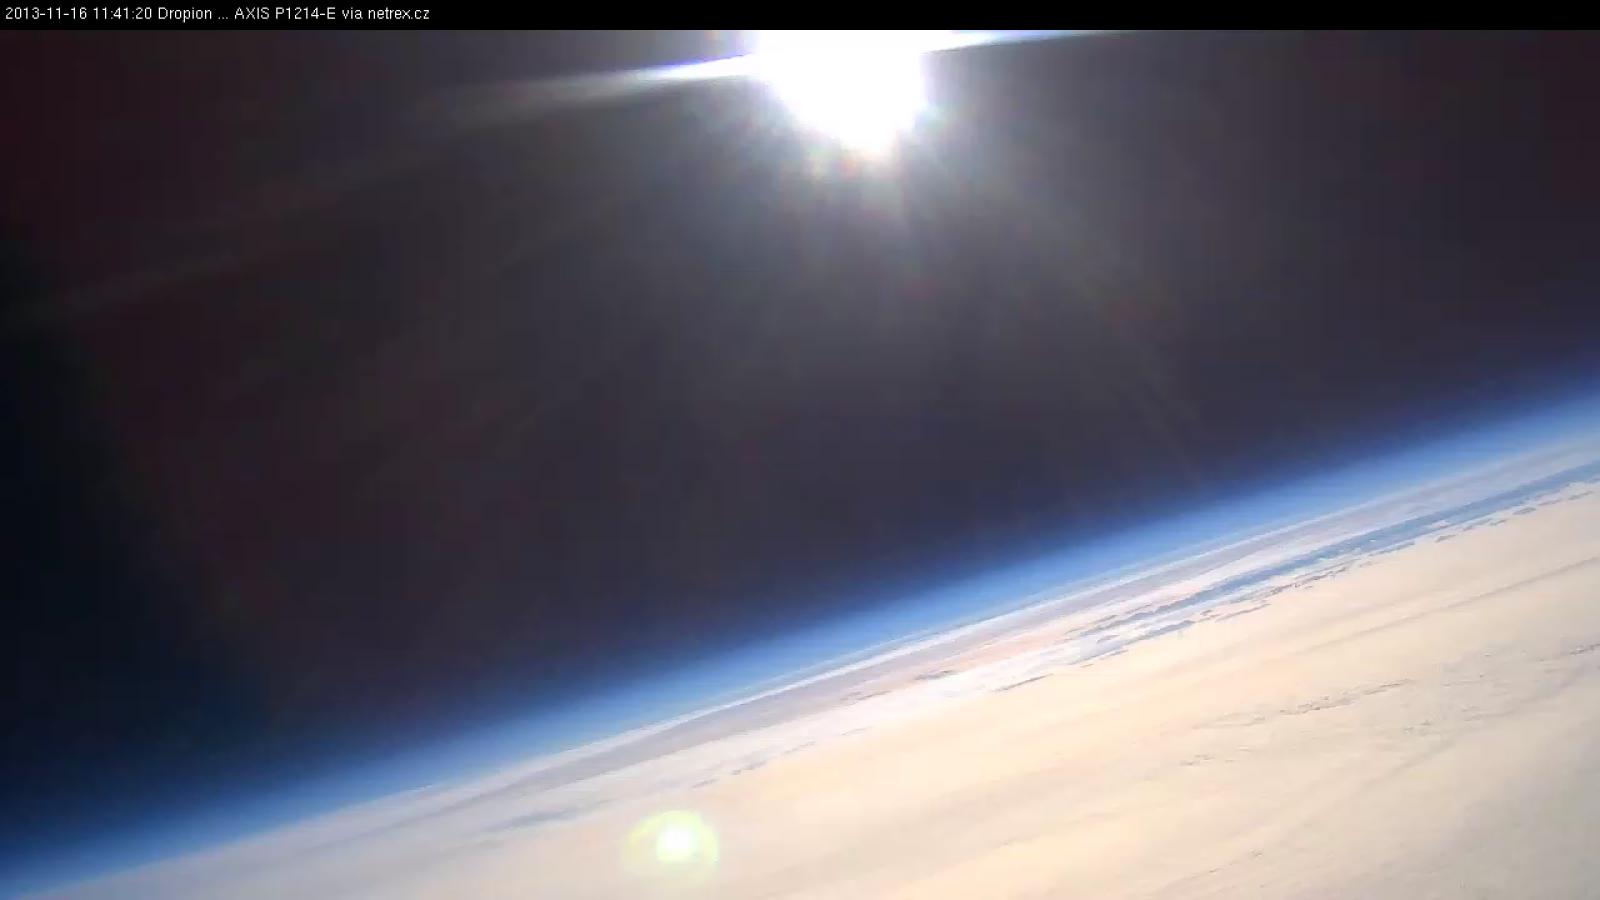 vlcsnap-2013-11-17-22h02m35s71.png